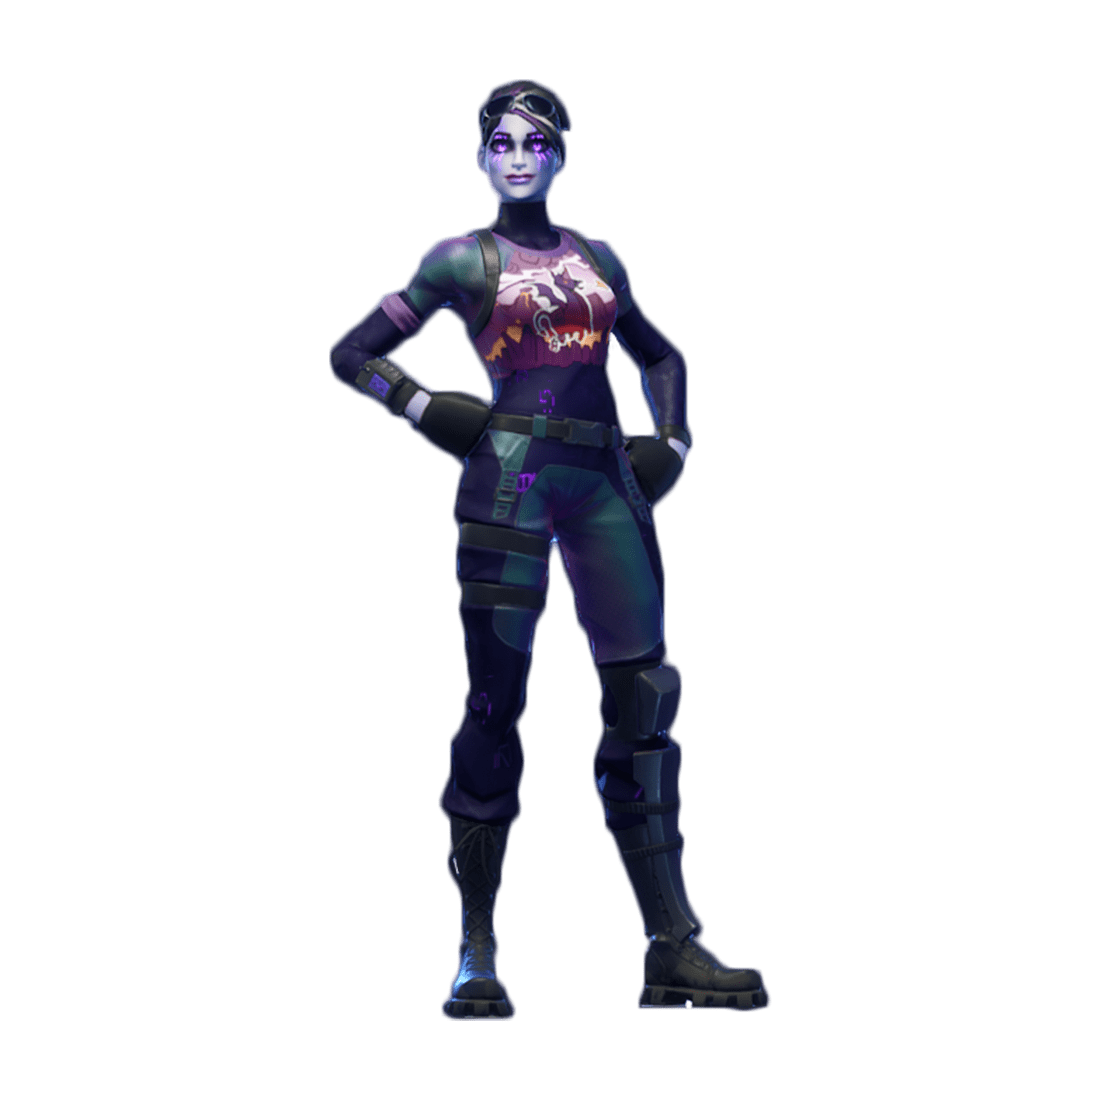 Fortnite Dark Bomber Skin.